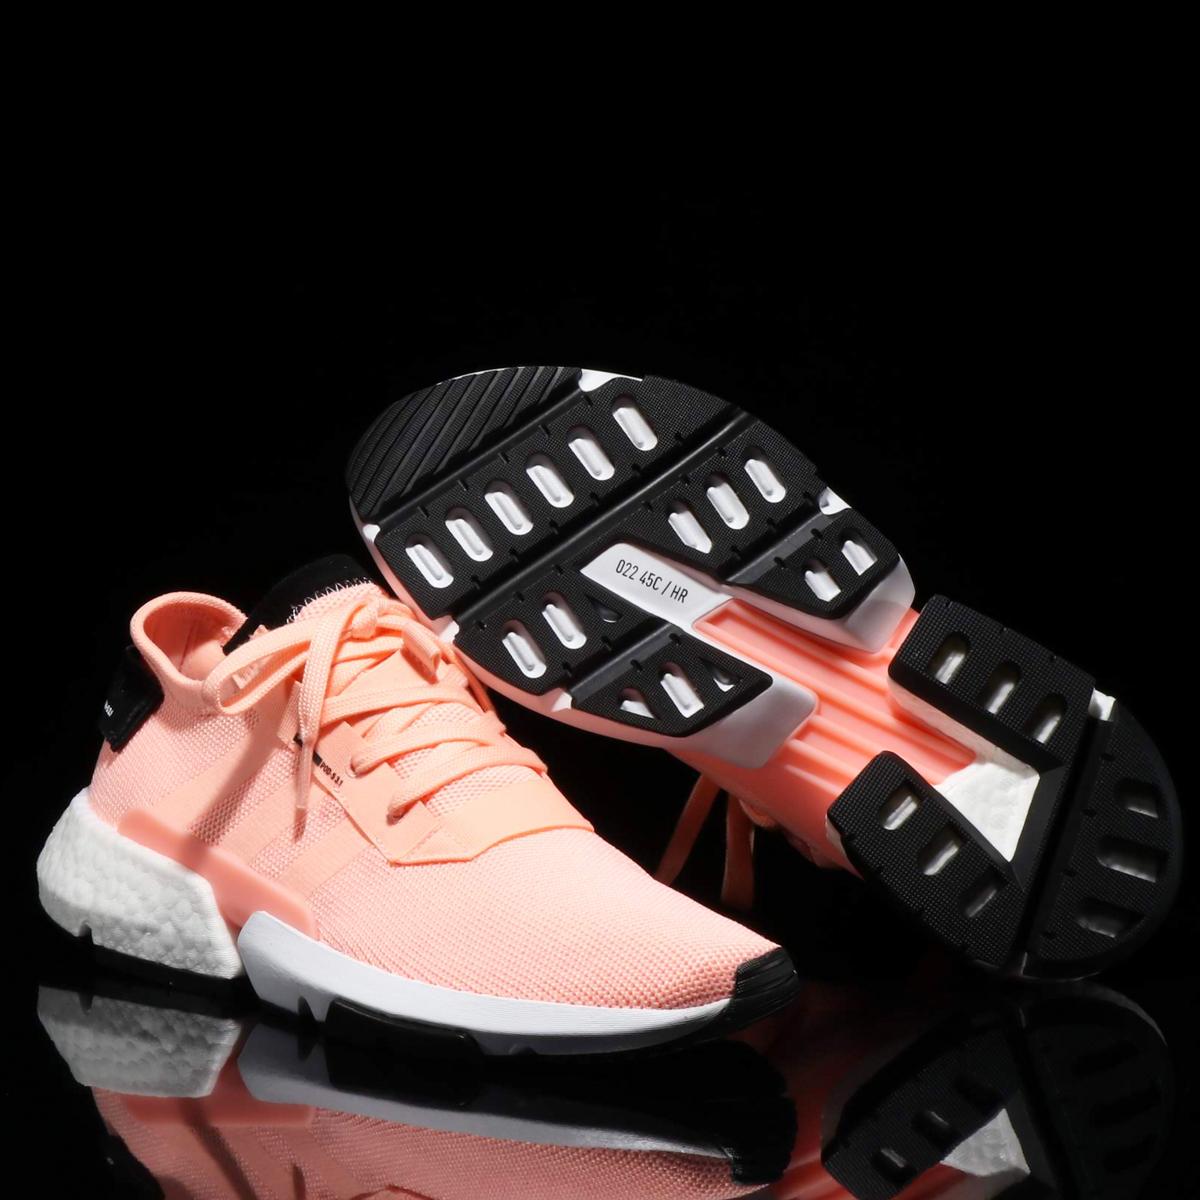 adidas Originals POD-S3.1(アディダス オリジナルス ピーオーディーS3.1)CLEAR ORANGE/CLEAR ORANGE/CORE BLACK【メンズ スニーカー】18FW-I